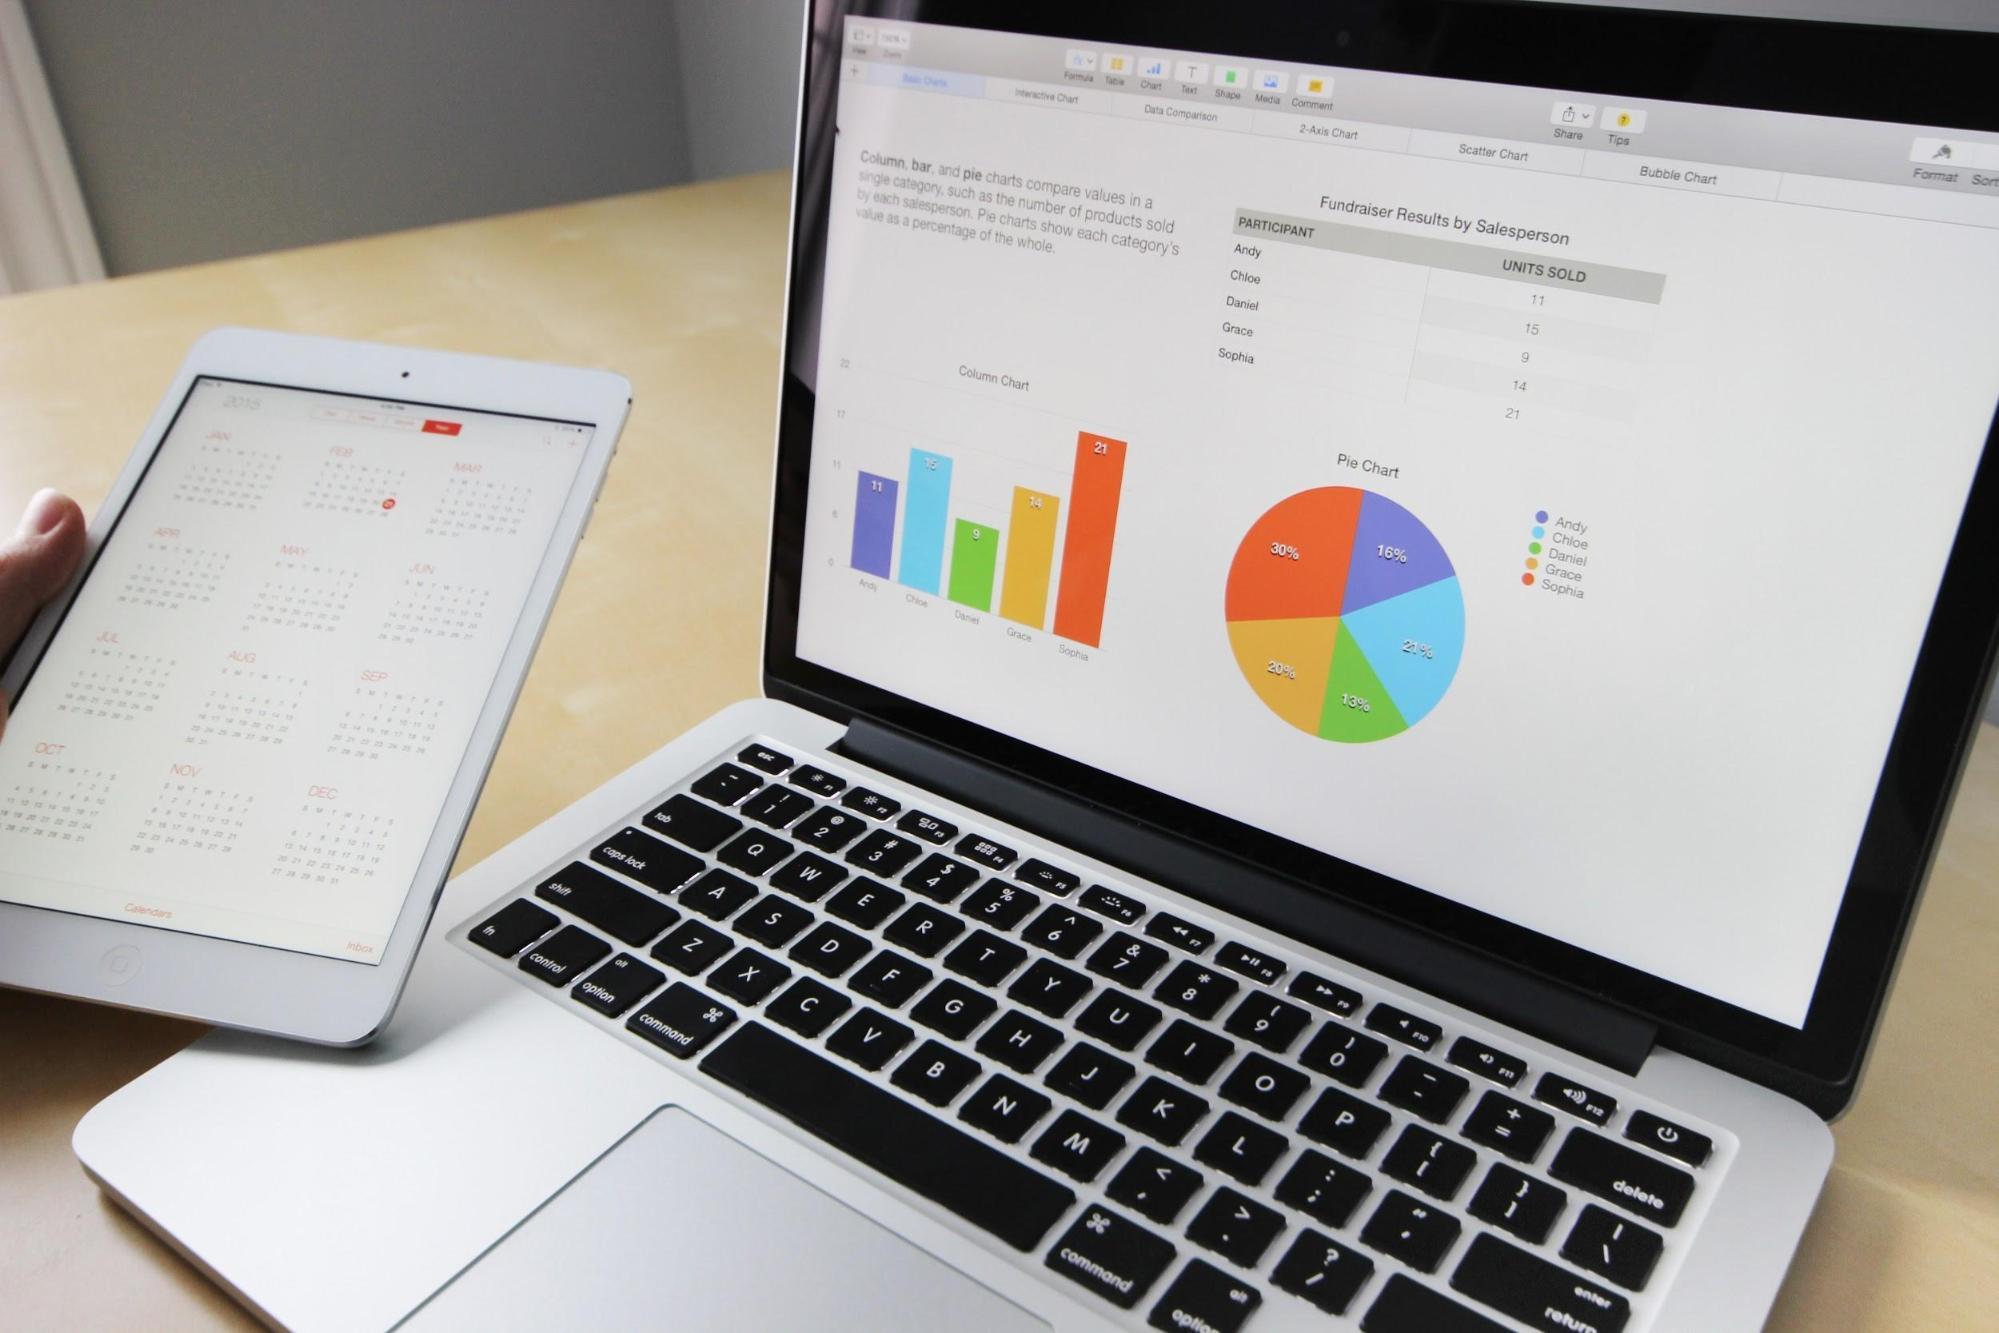 IoT digital marketing